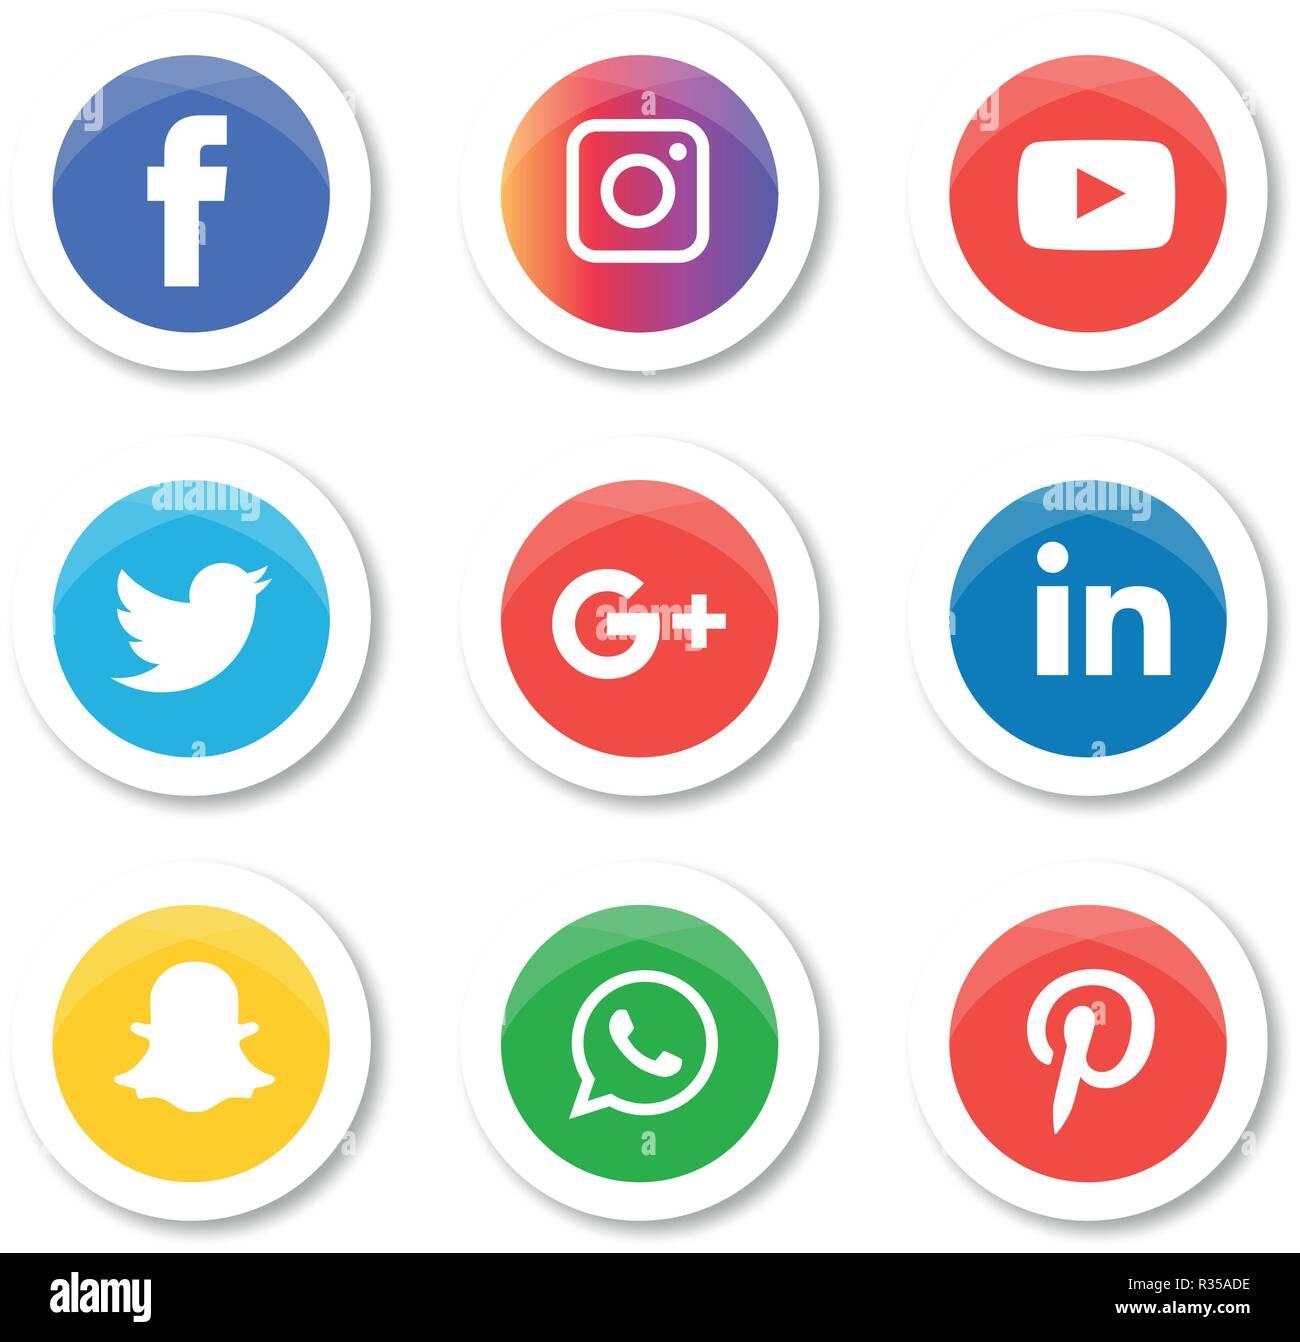 Social media icons set Logo Vector Illustrator, facebook, instagram, twitter,  whatsapp, communication, google plus, device, youtube, smart, phone, net f6a76cf76a